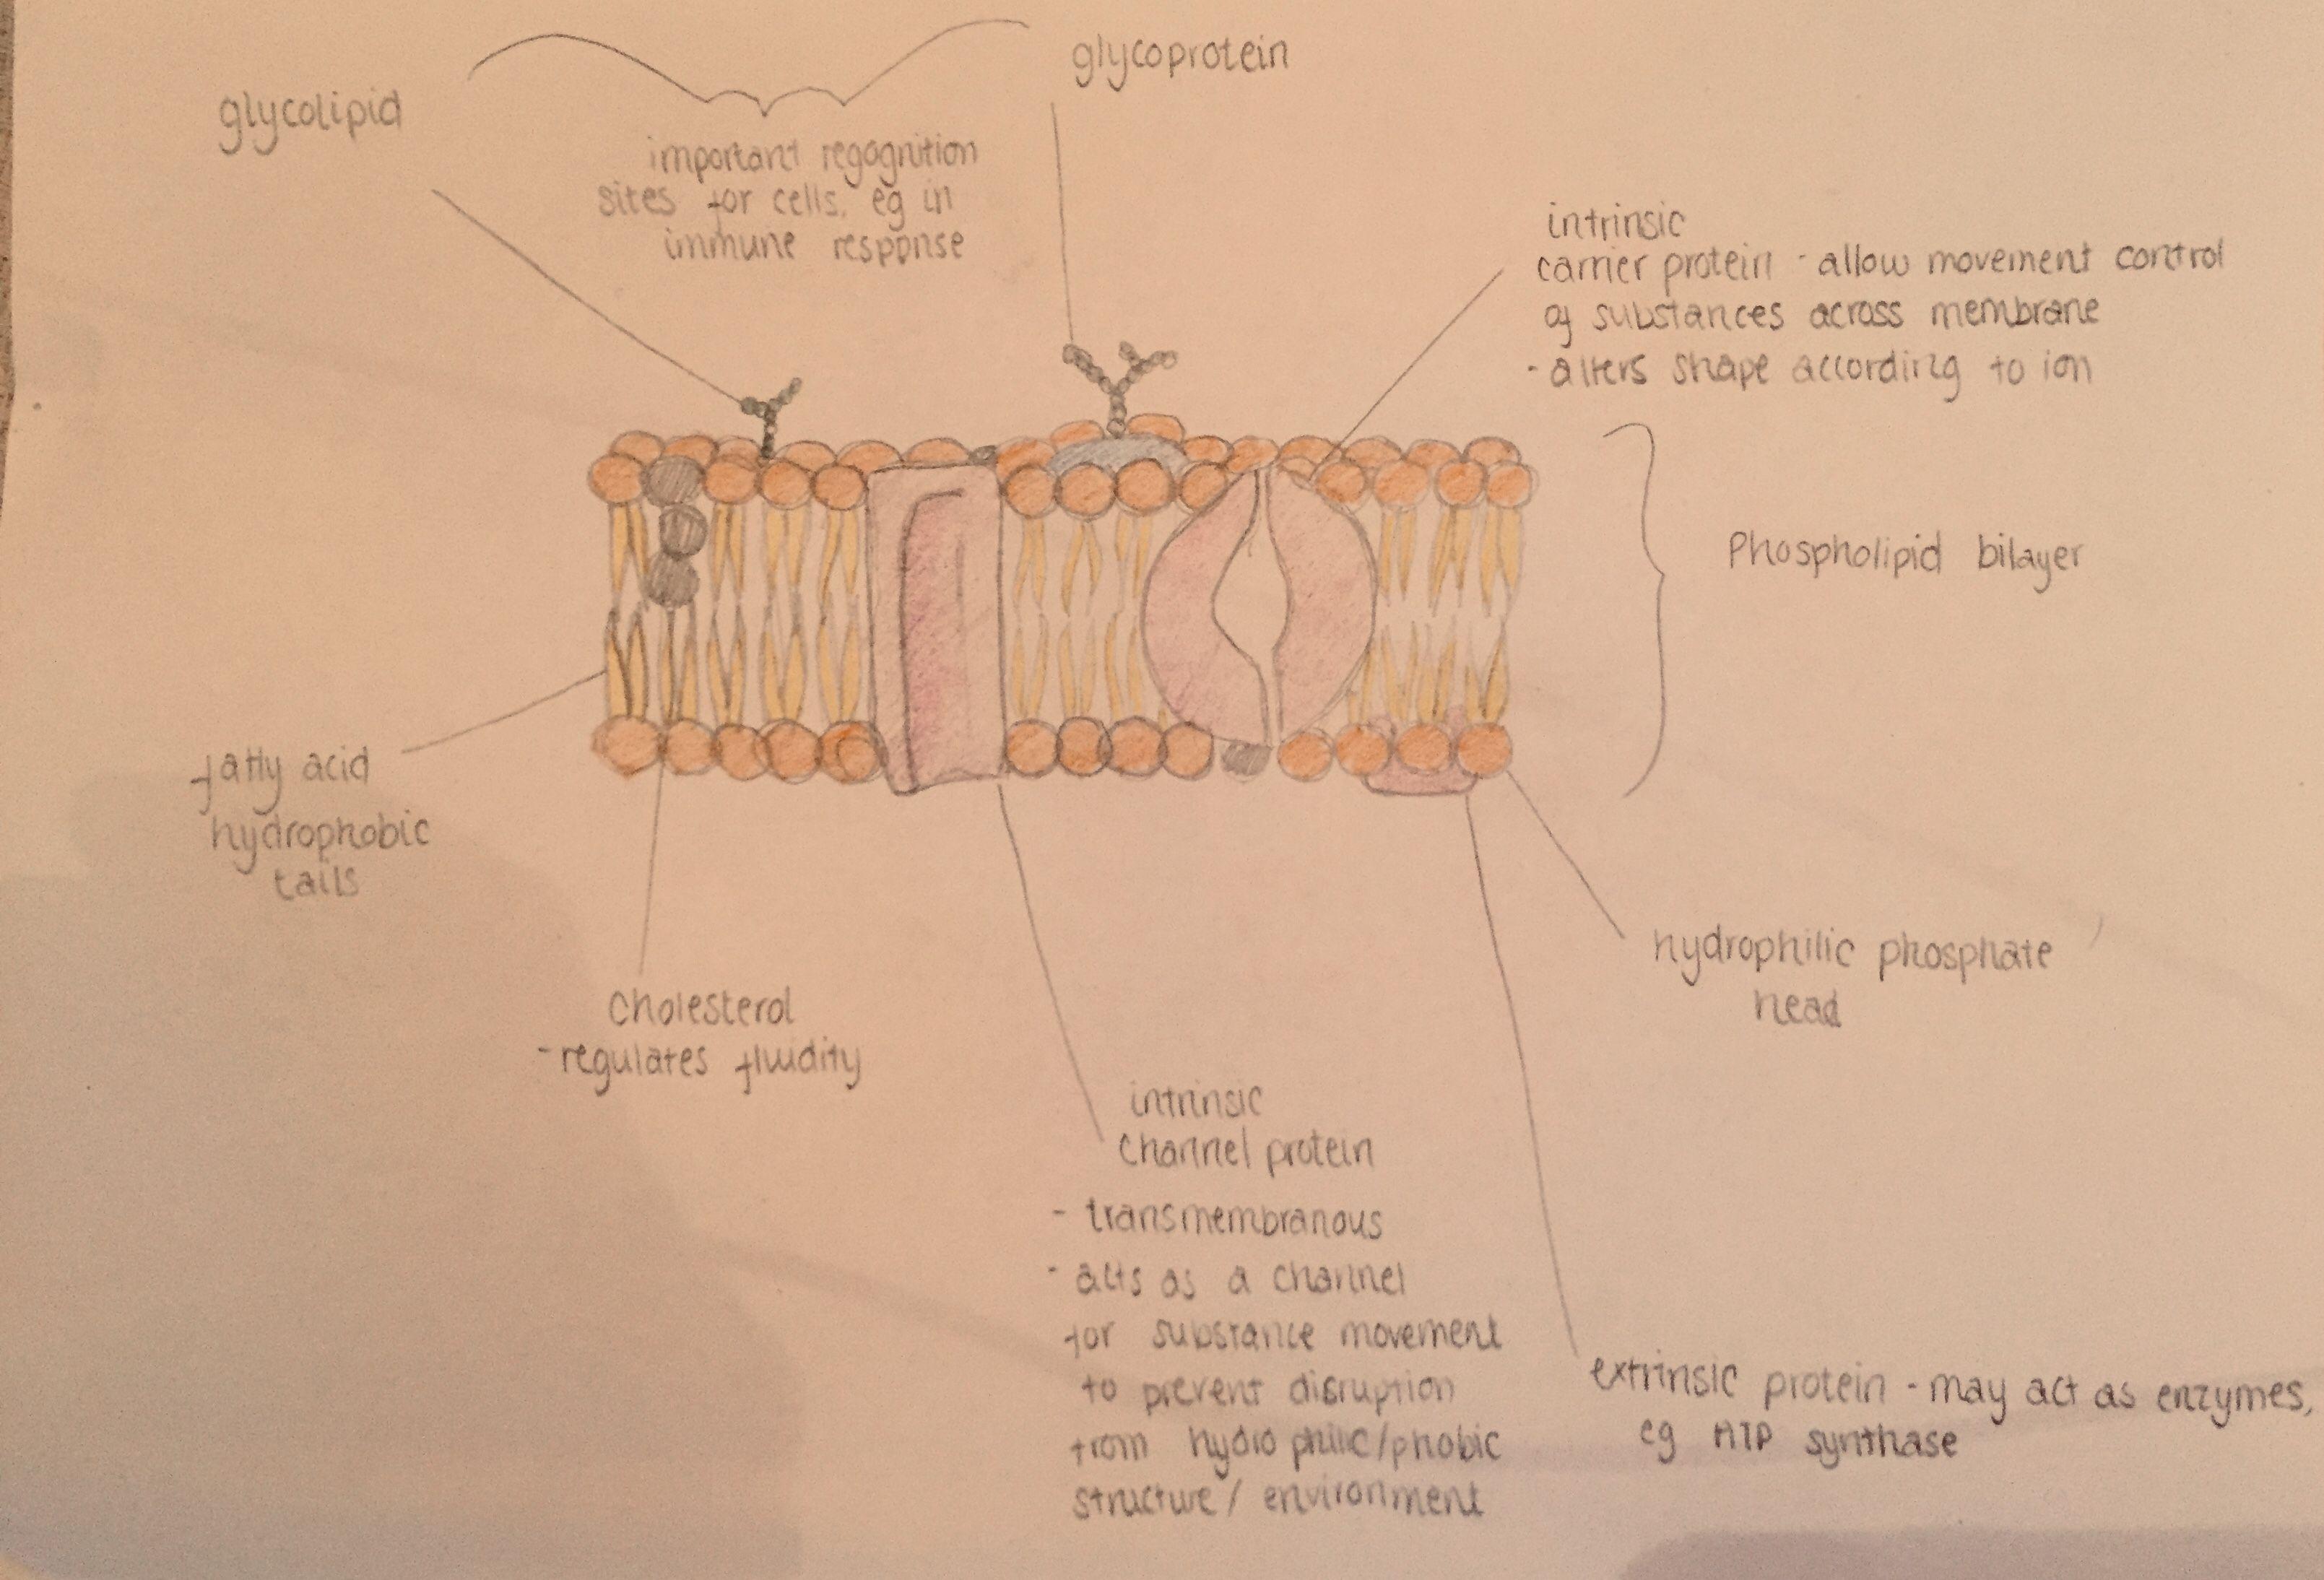 Basic Structure Of Phospholipid Bilayer School Organization Notes Biology Notes Nursing Notes [ 2188 x 3218 Pixel ]